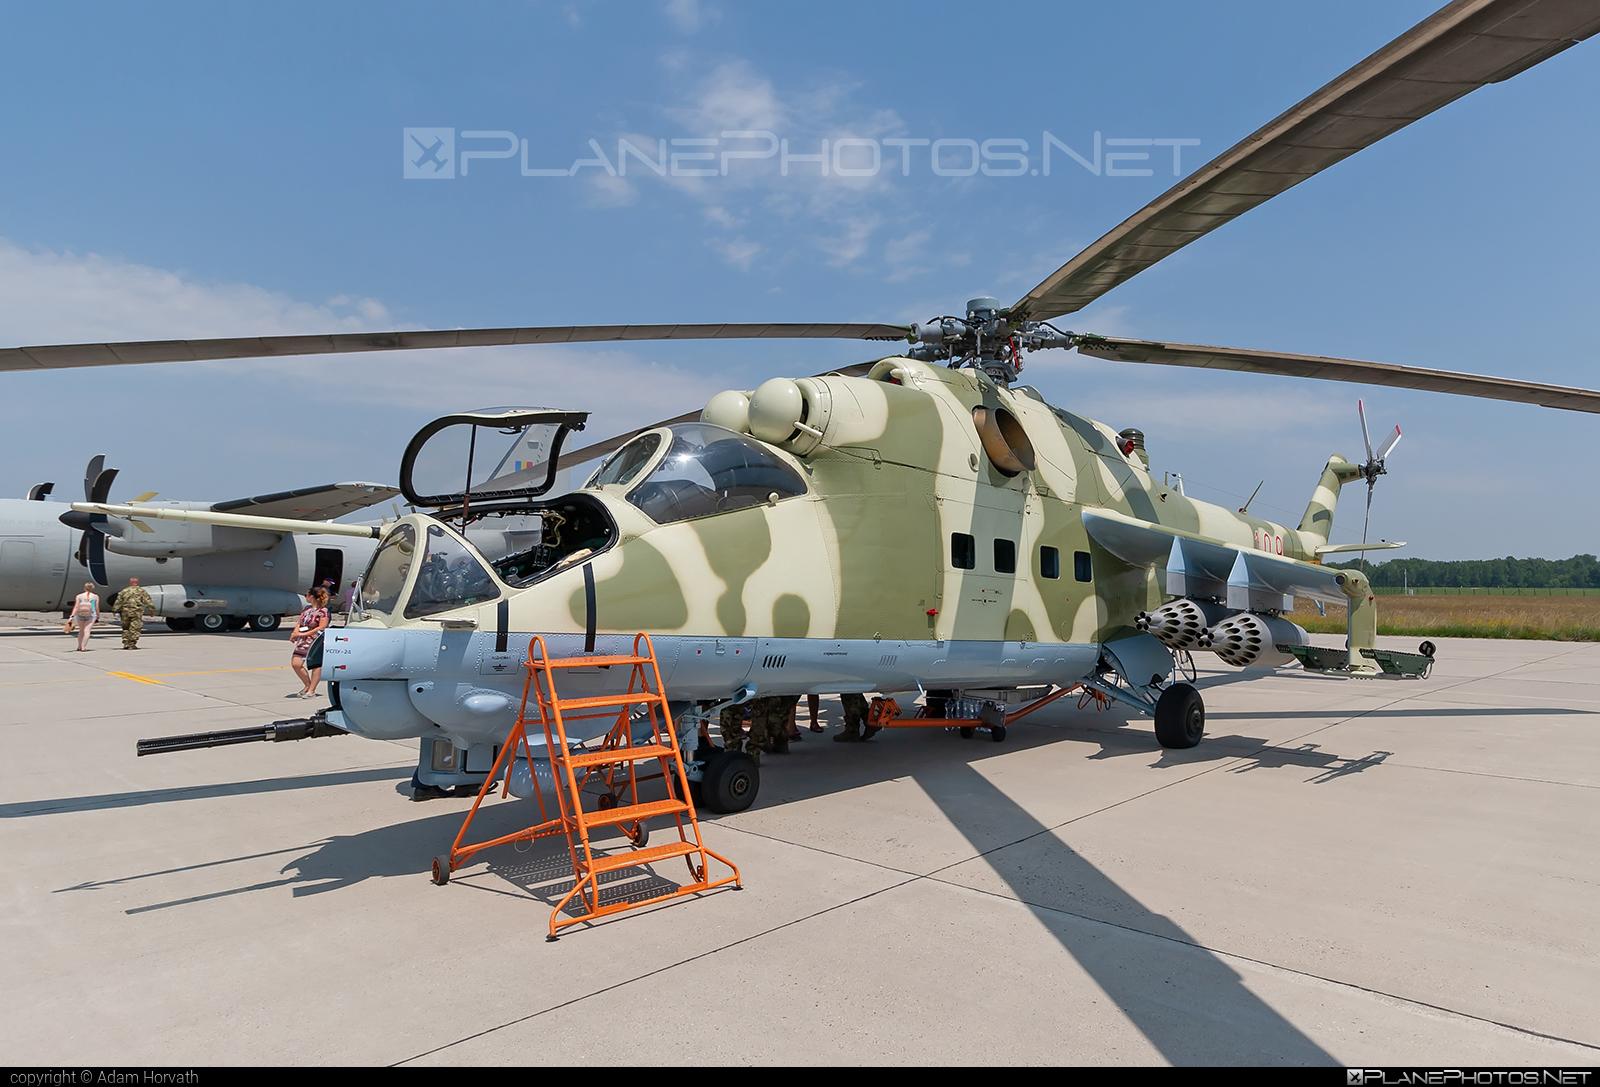 Mil Mi-24D - 109 operated by Magyar Légierő (Hungarian Air Force) #hungarianairforce #magyarlegiero #mi24 #mi24d #mil #mil24 #mil24d #milhelicopters